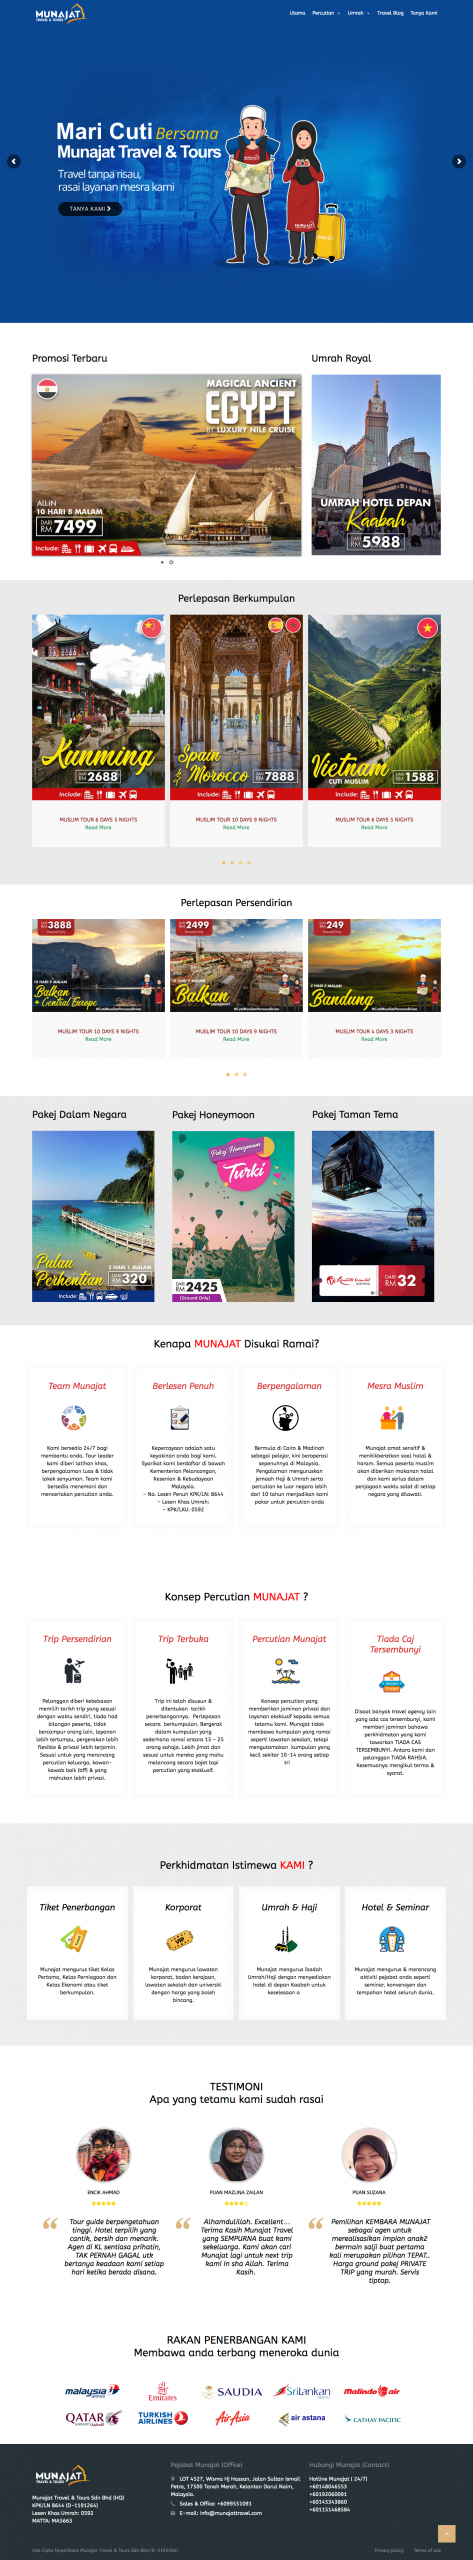 Laman Web Munajat Travel